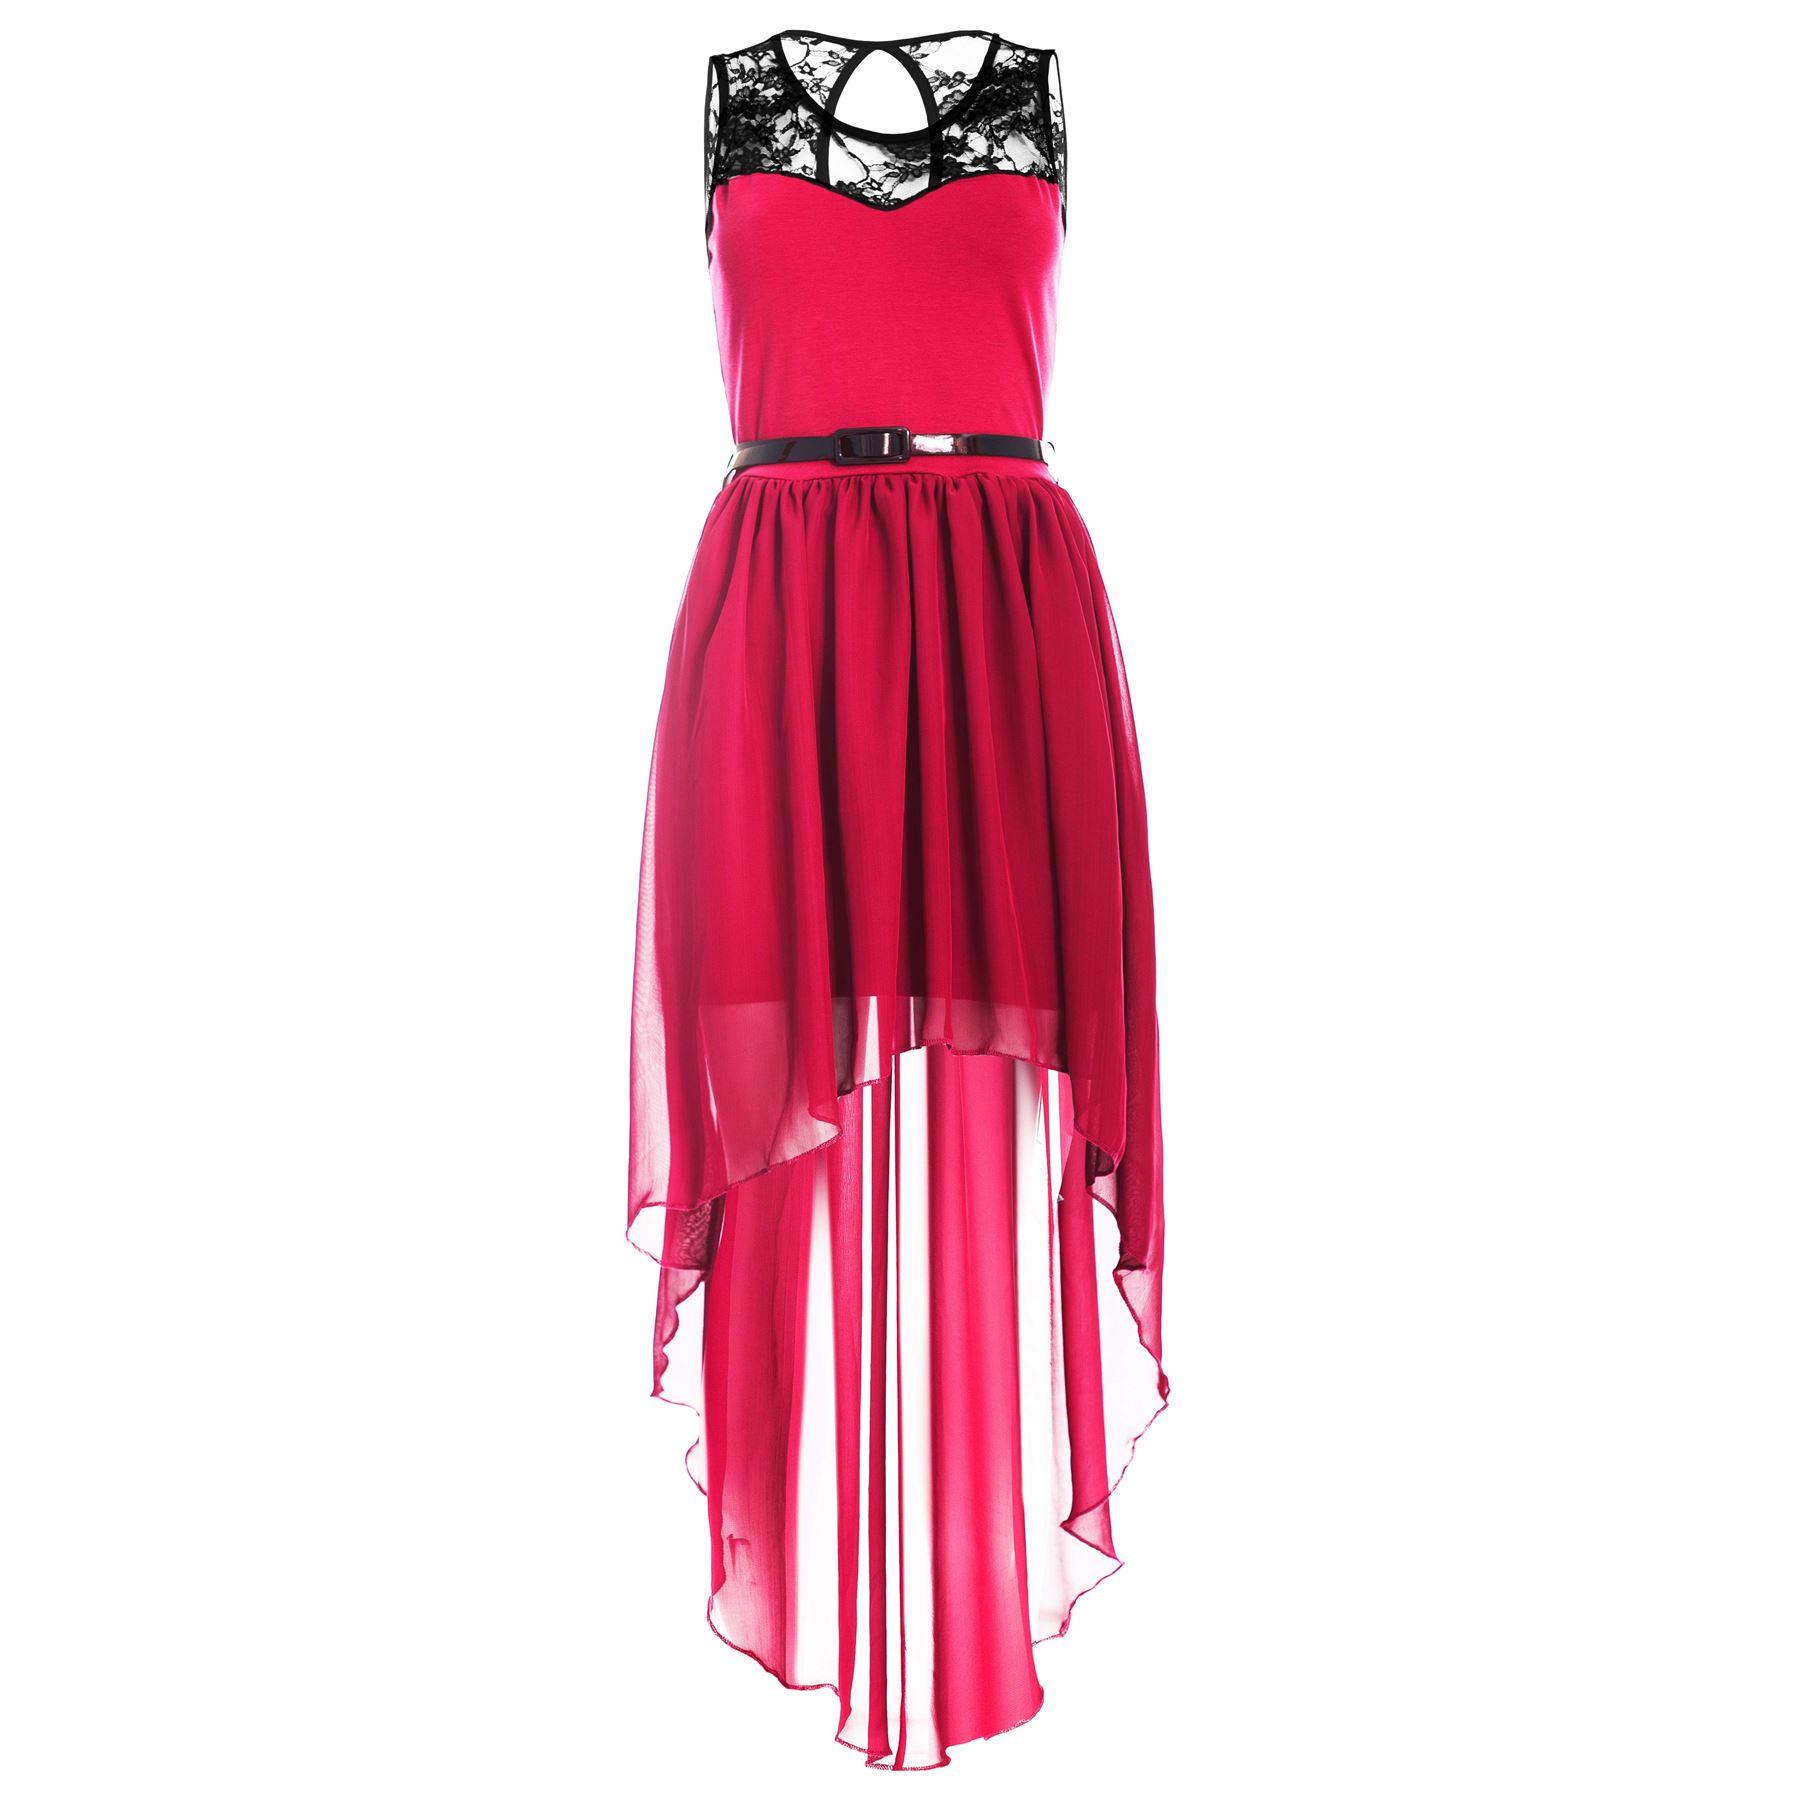 Womens-Ladies-Dip-Hem-High-Low-Assymetric-Lace-Chiffon-Belted-Mixi-Midi-Dress